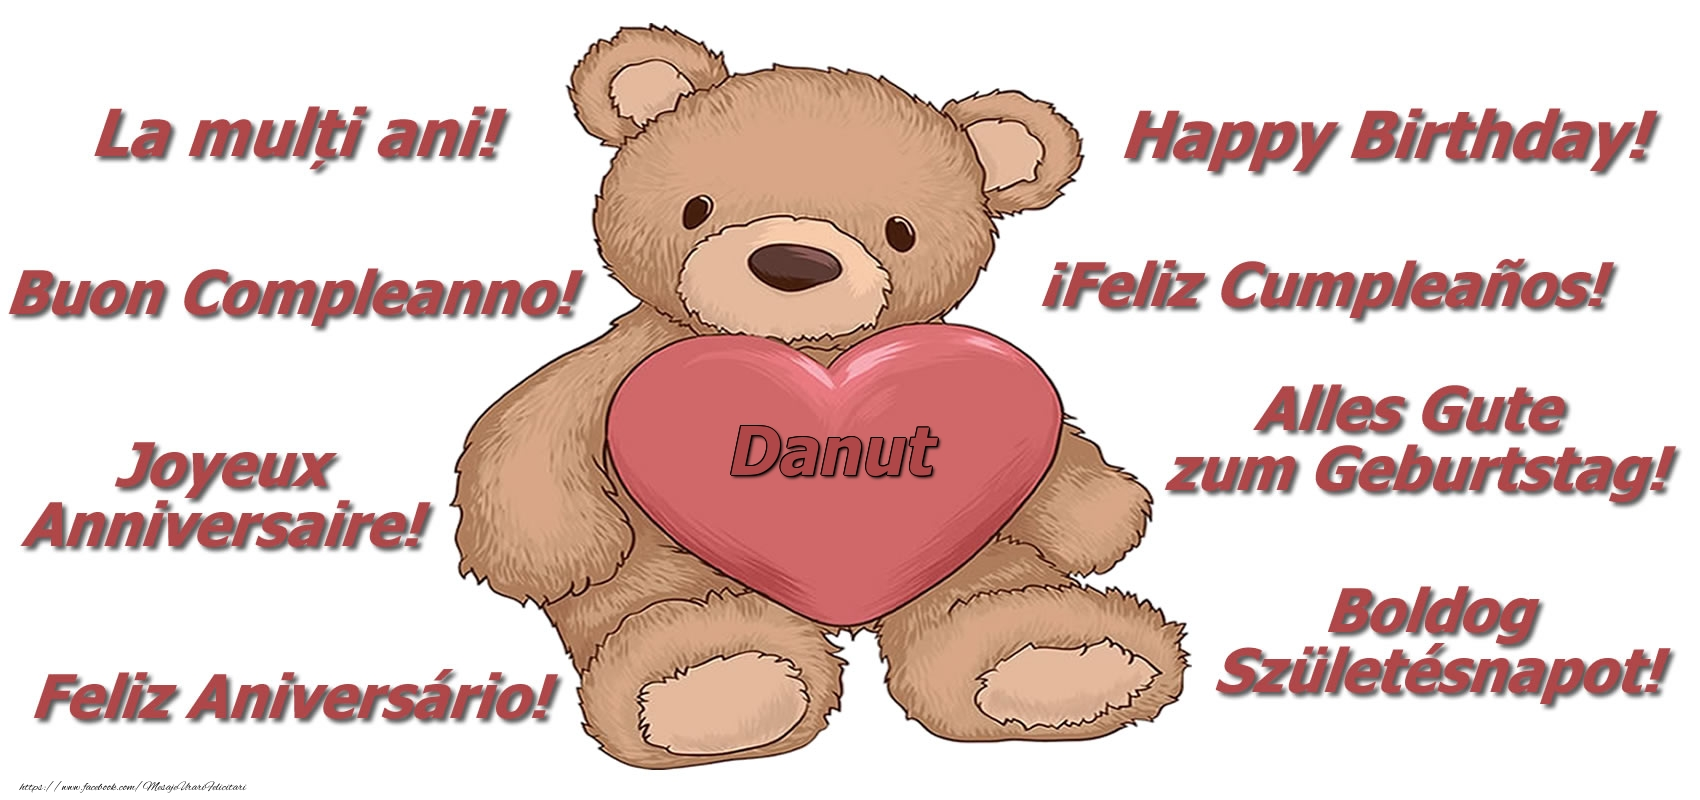 Felicitari de zi de nastere - La multi ani Danut! - Ursulet